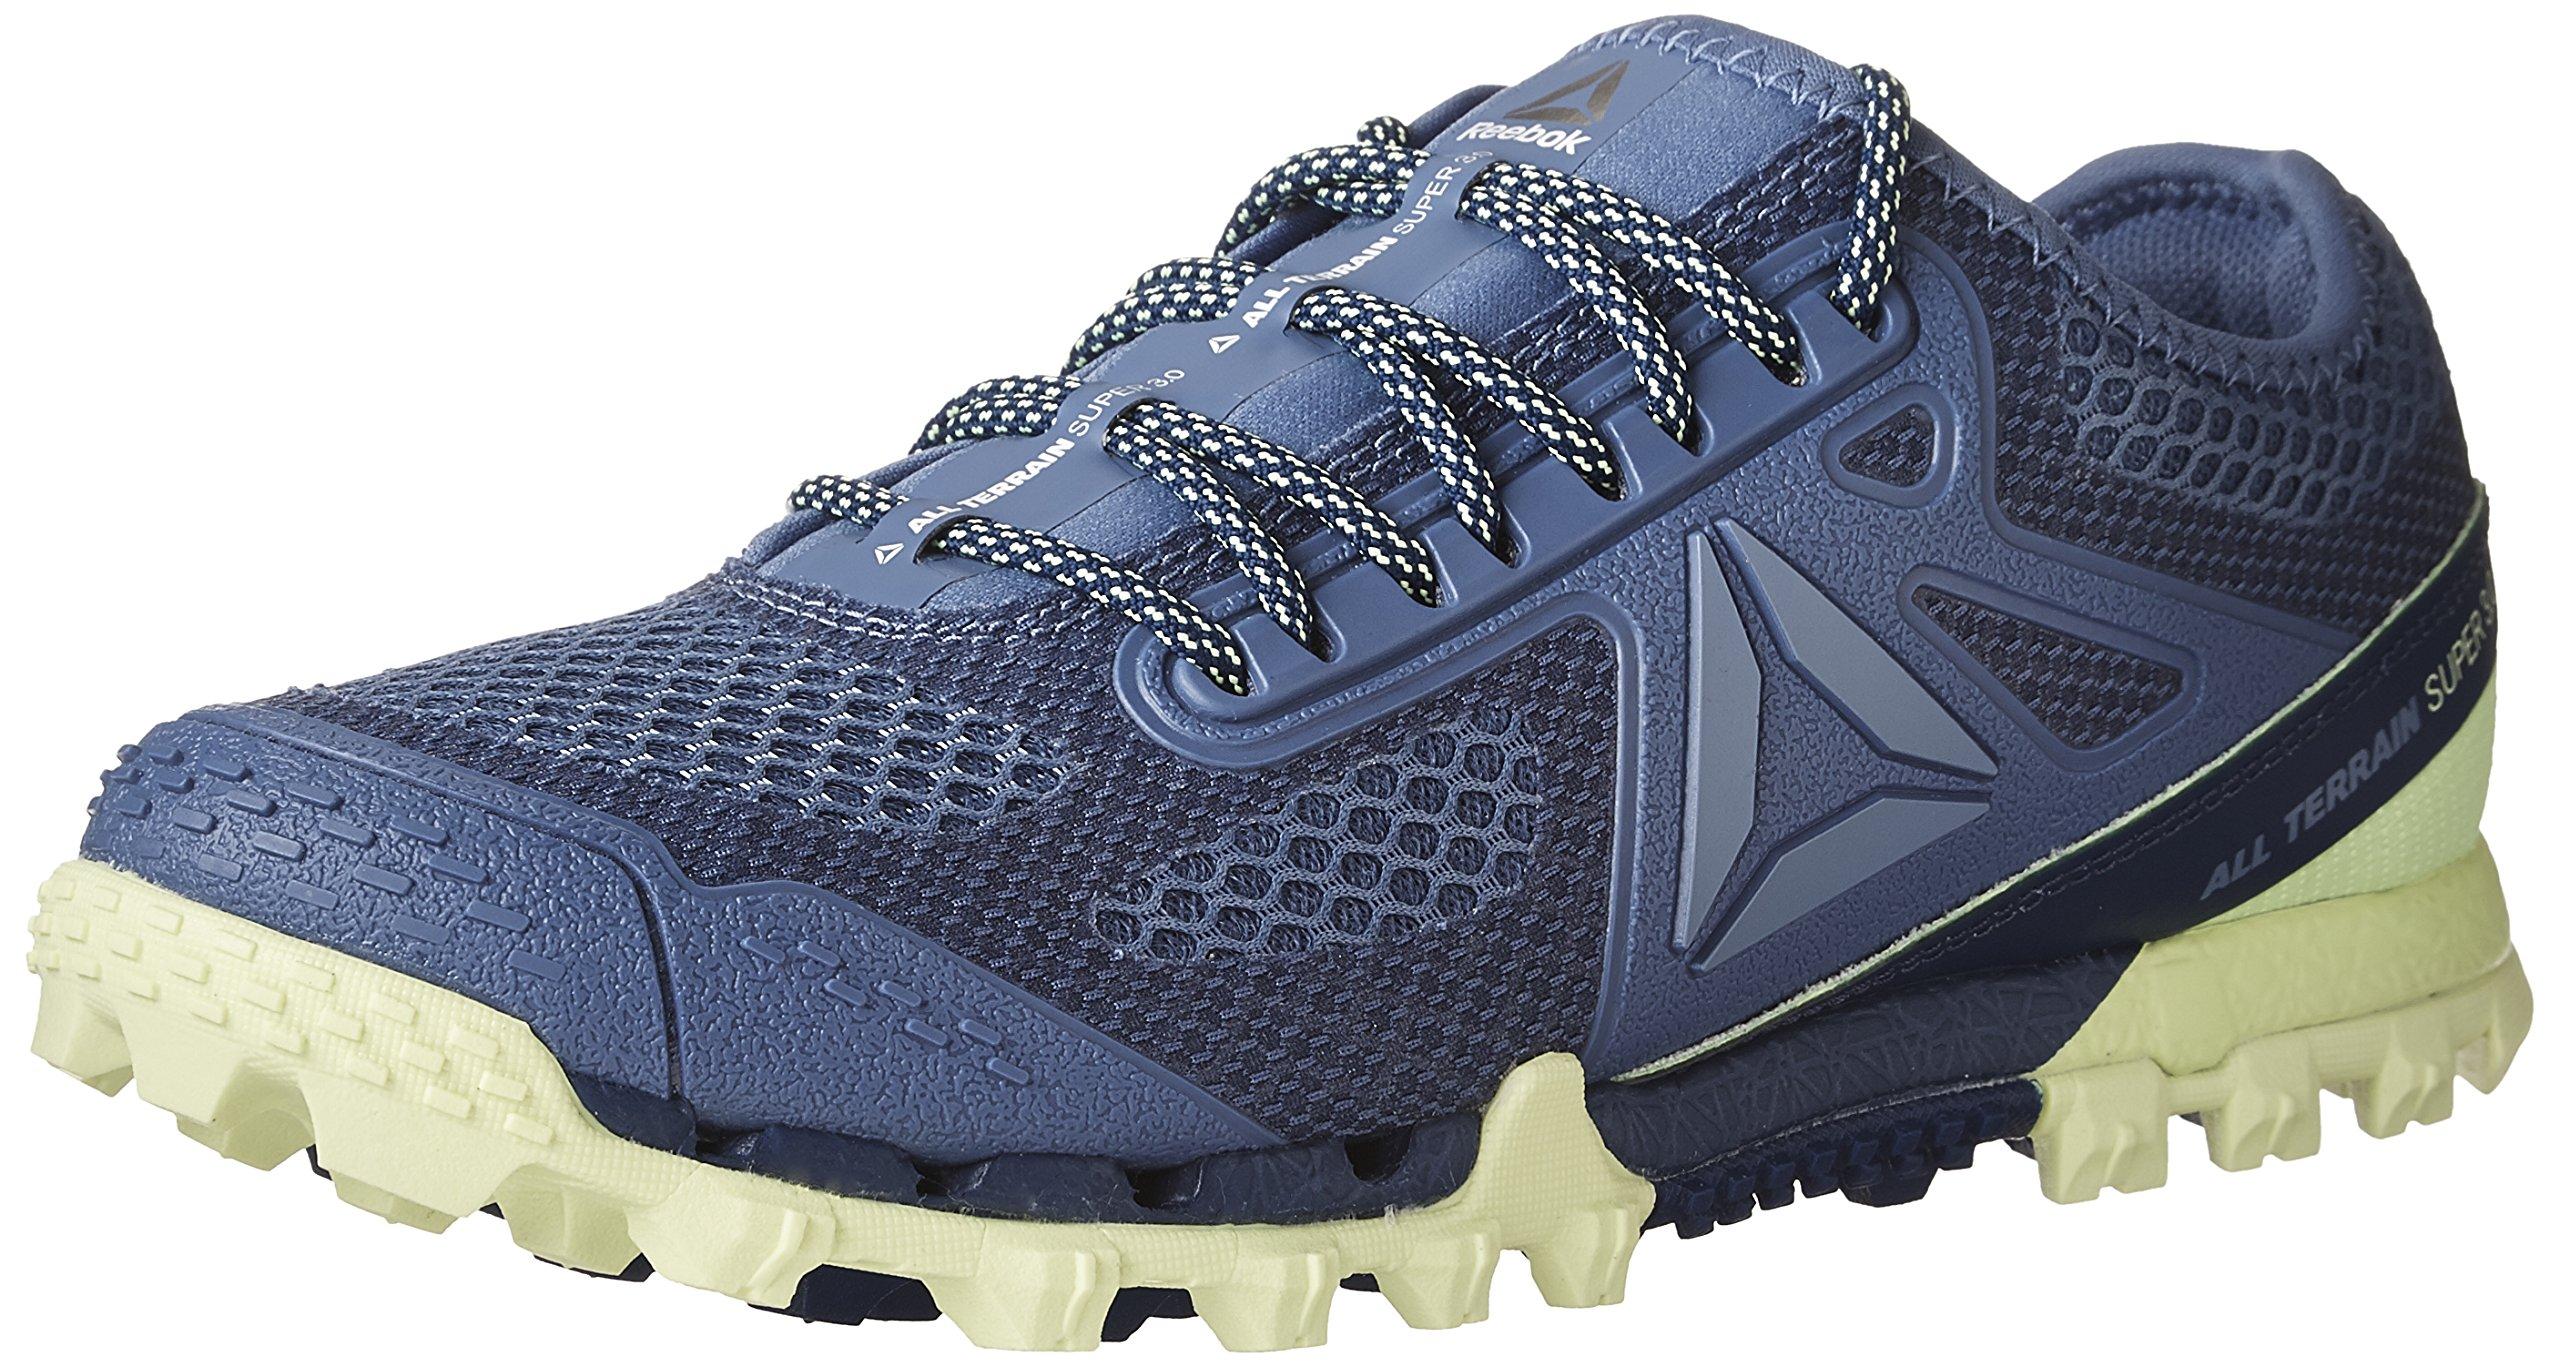 Reebok Women's All Terrain Super 3.0 Track Shoe, Lilac Shadow/Deep Cobalt/Coll. Navy/Electric Flash, 7 M US